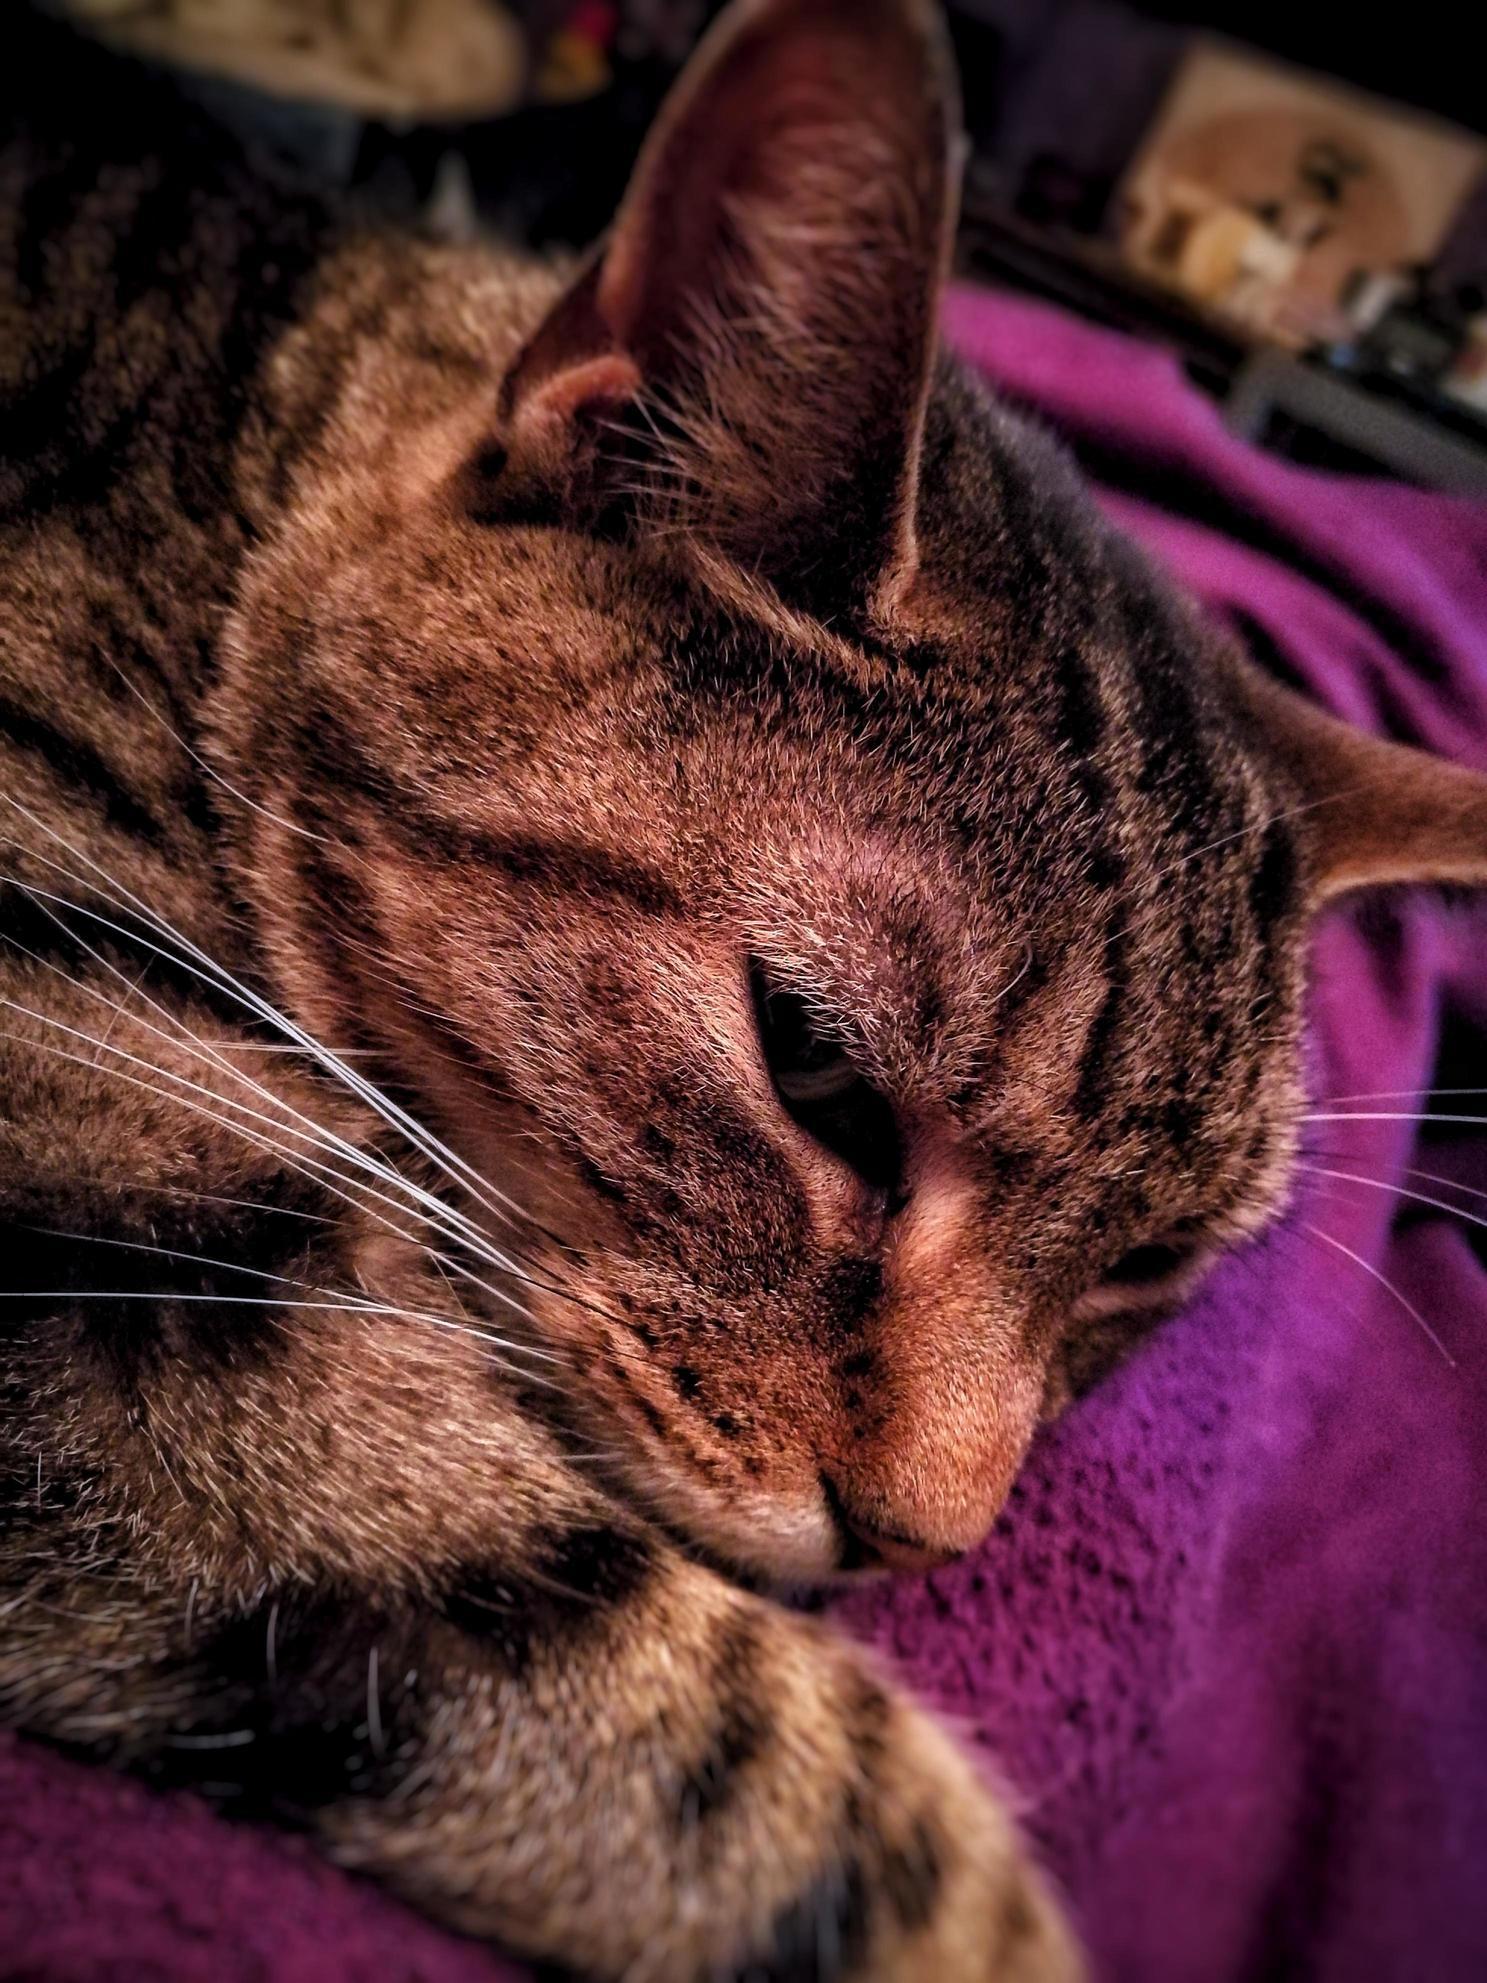 A sleepy fudge